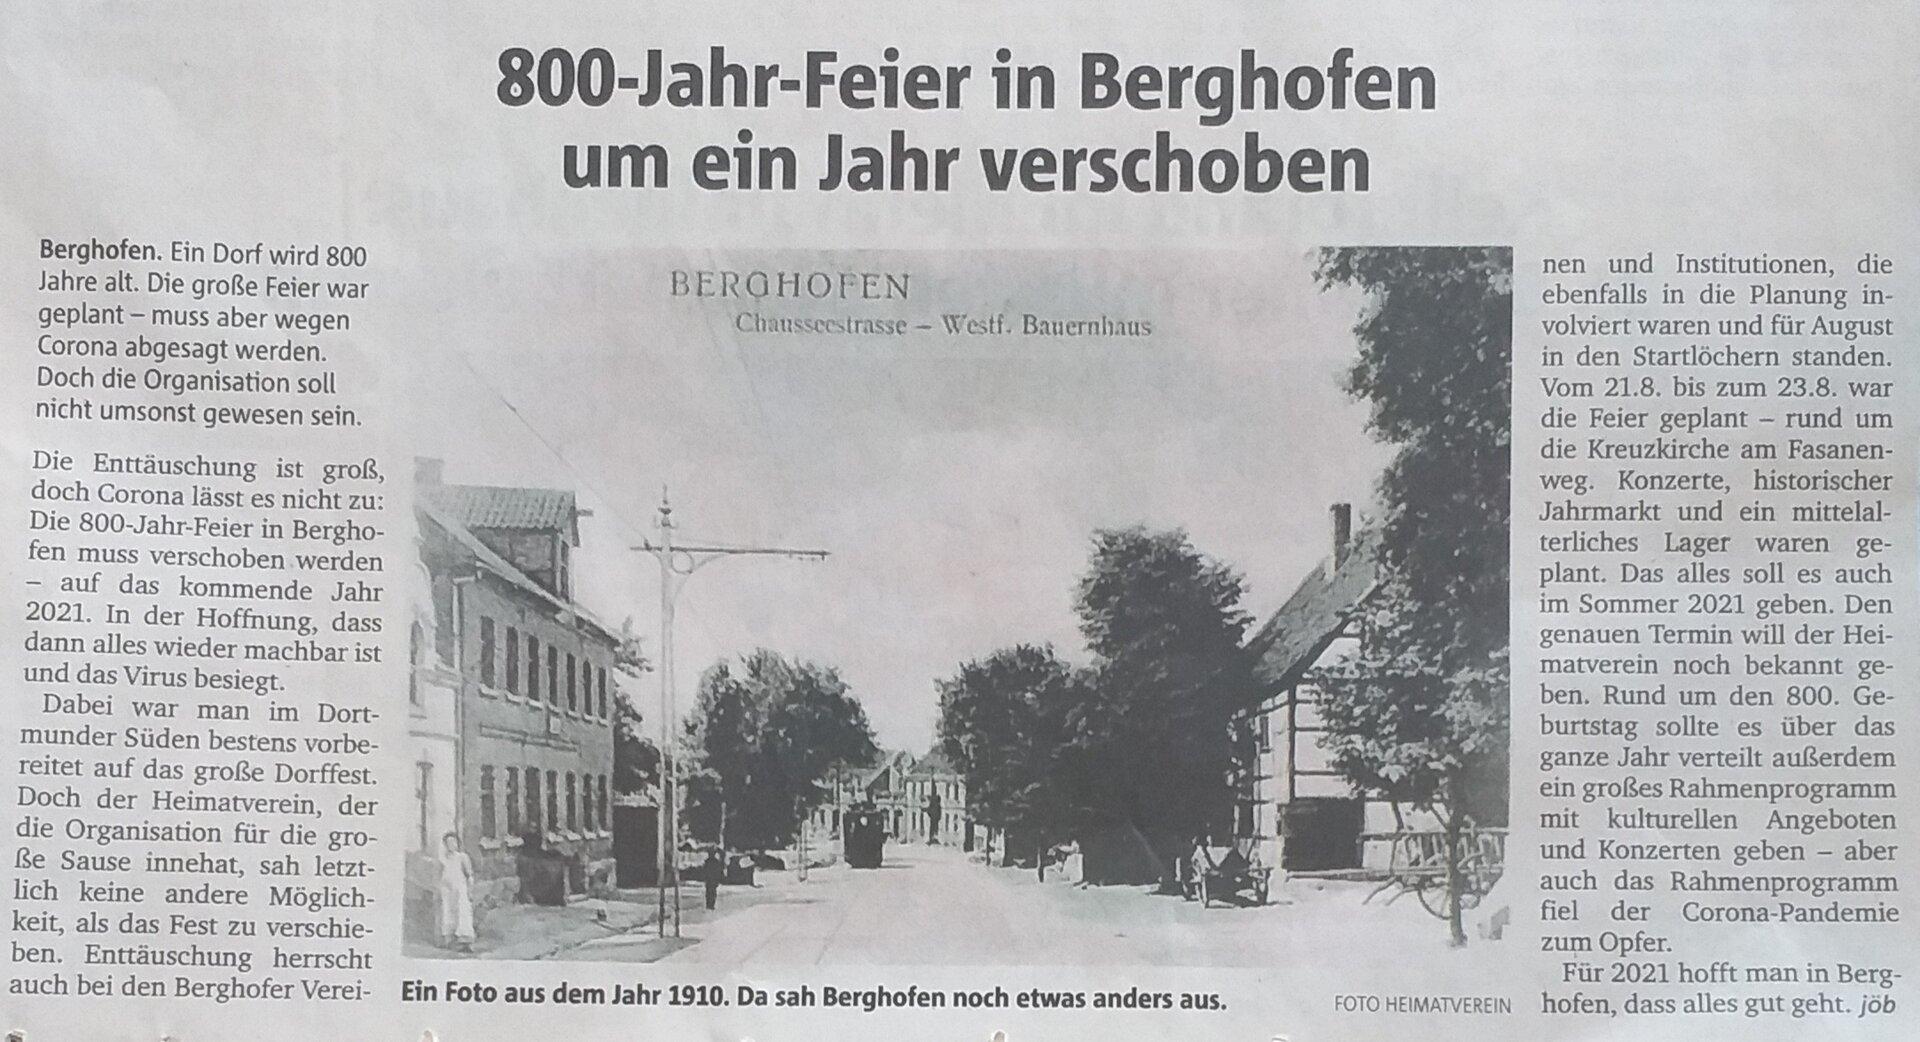 800 Jahr Feier verschoben